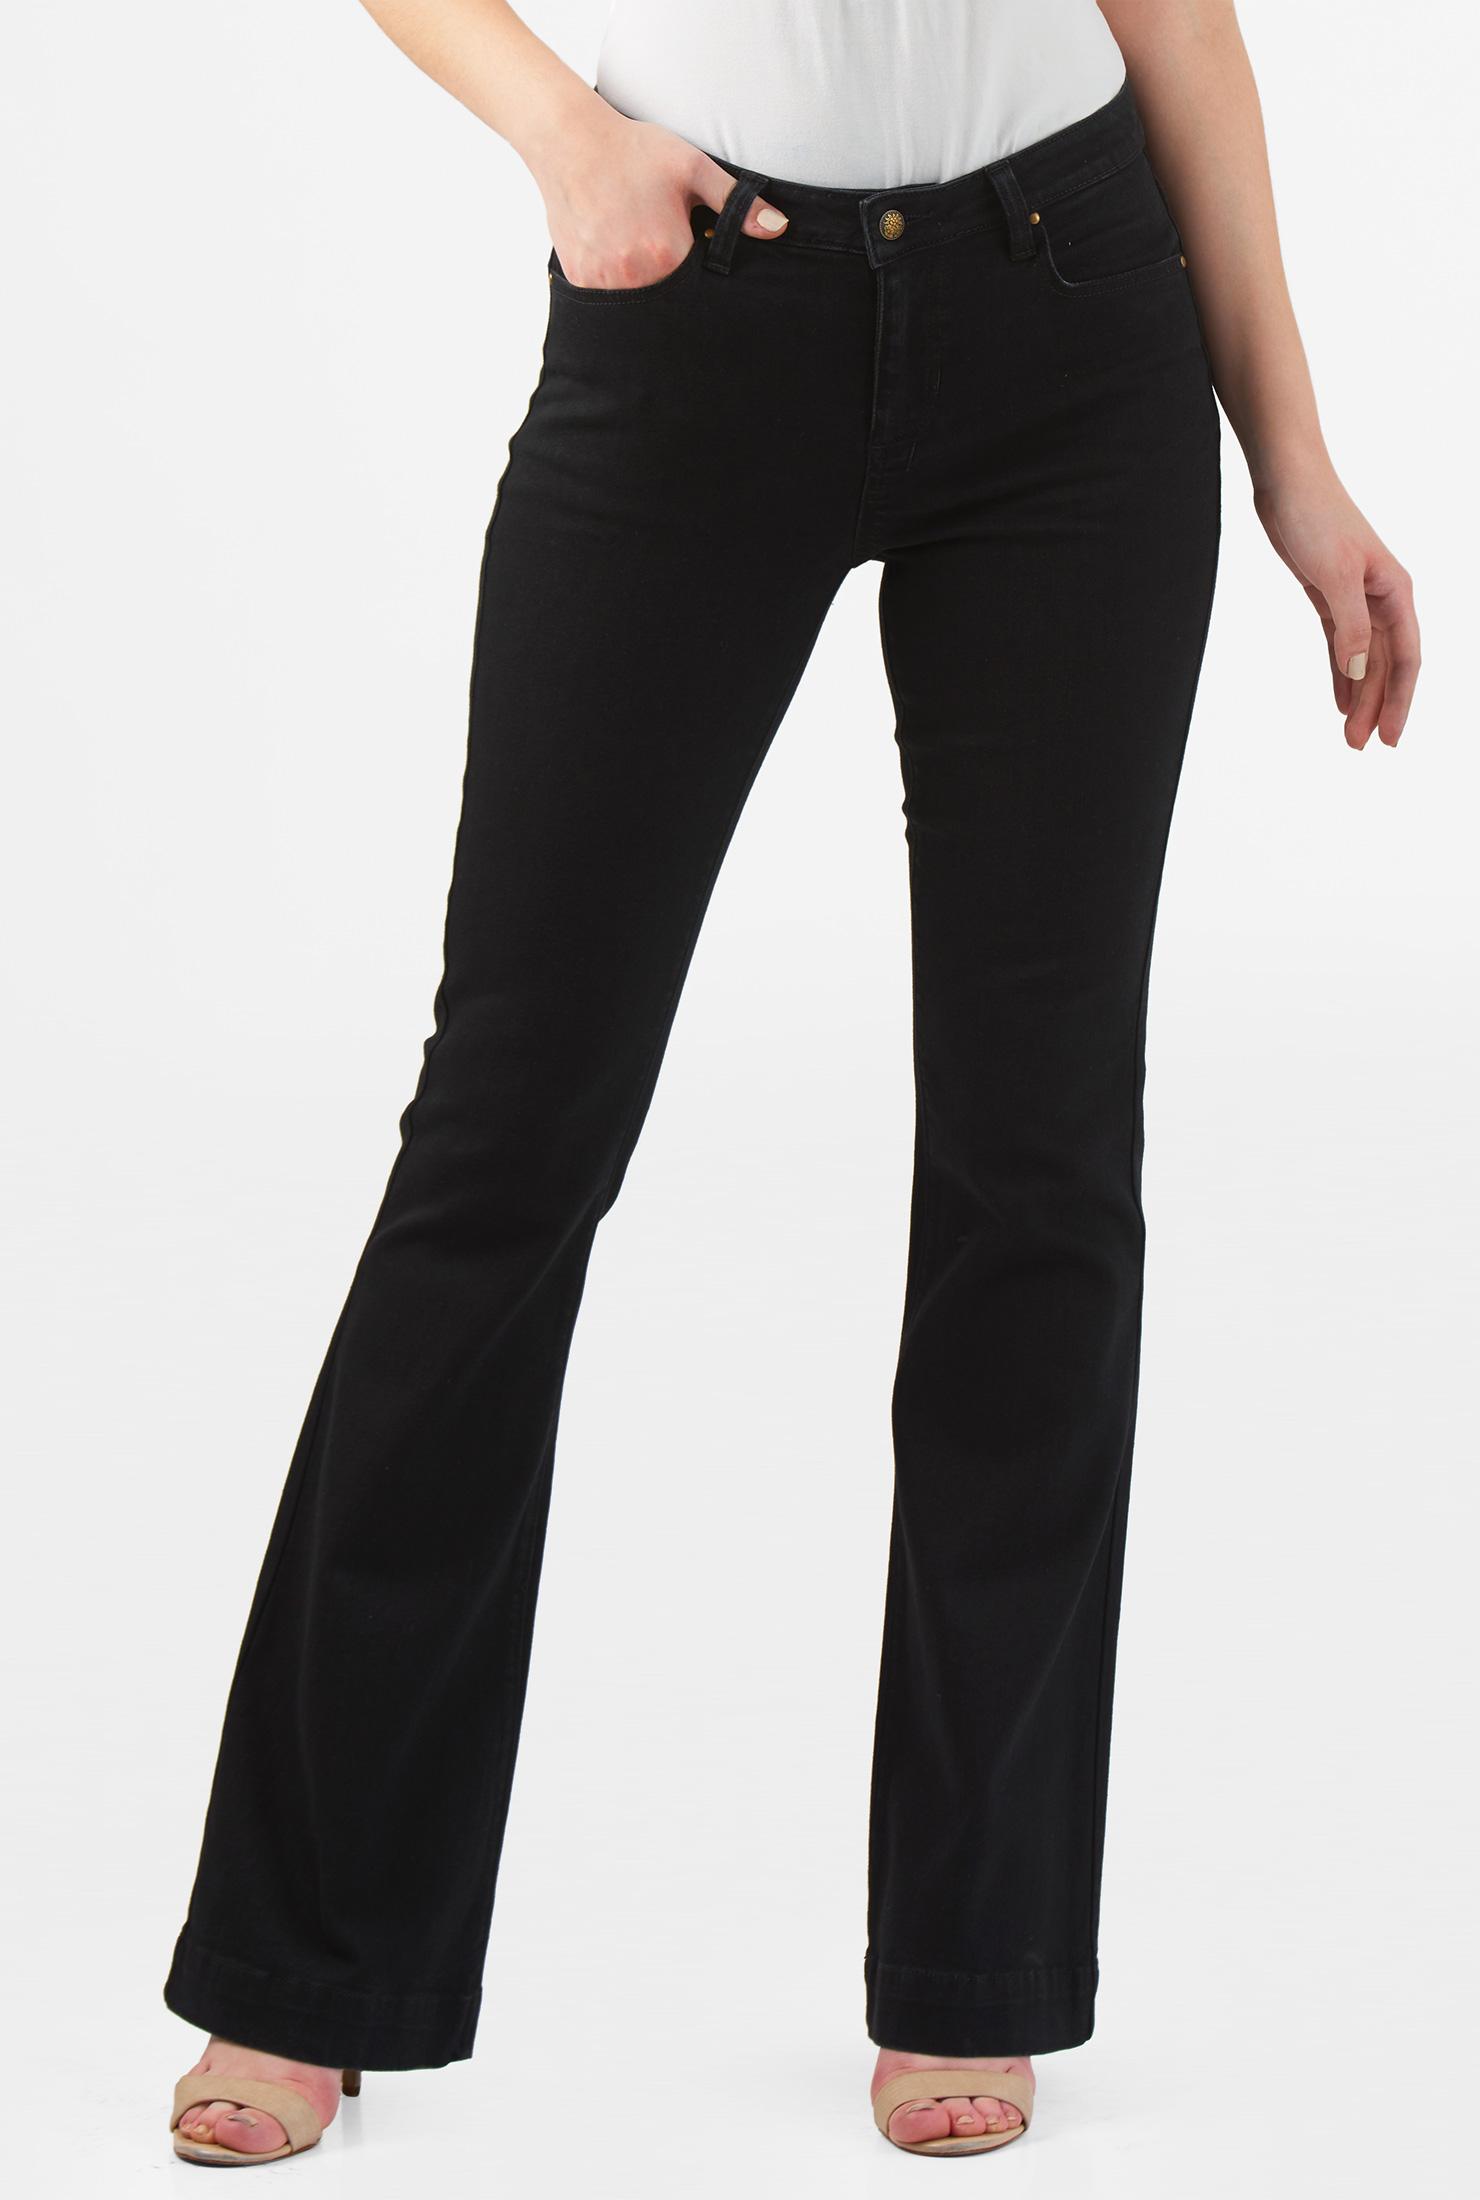 Eshakti Womens Black Denim Flare Jeans